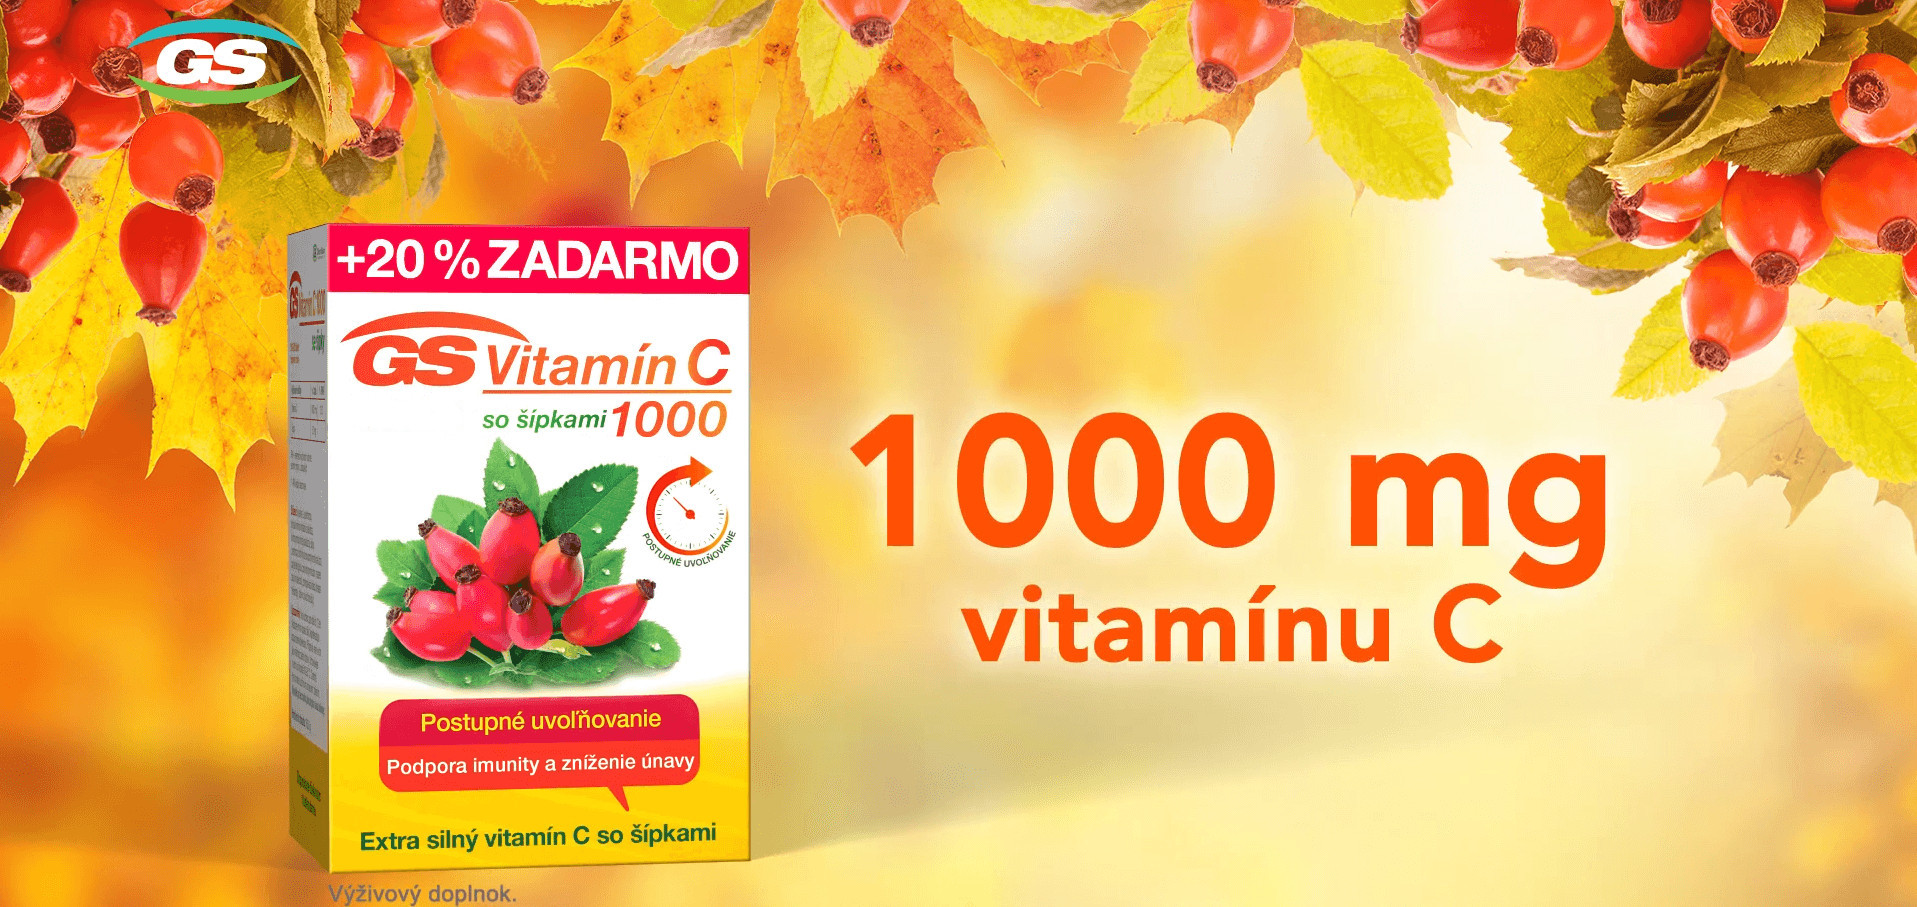 GS vitamín C